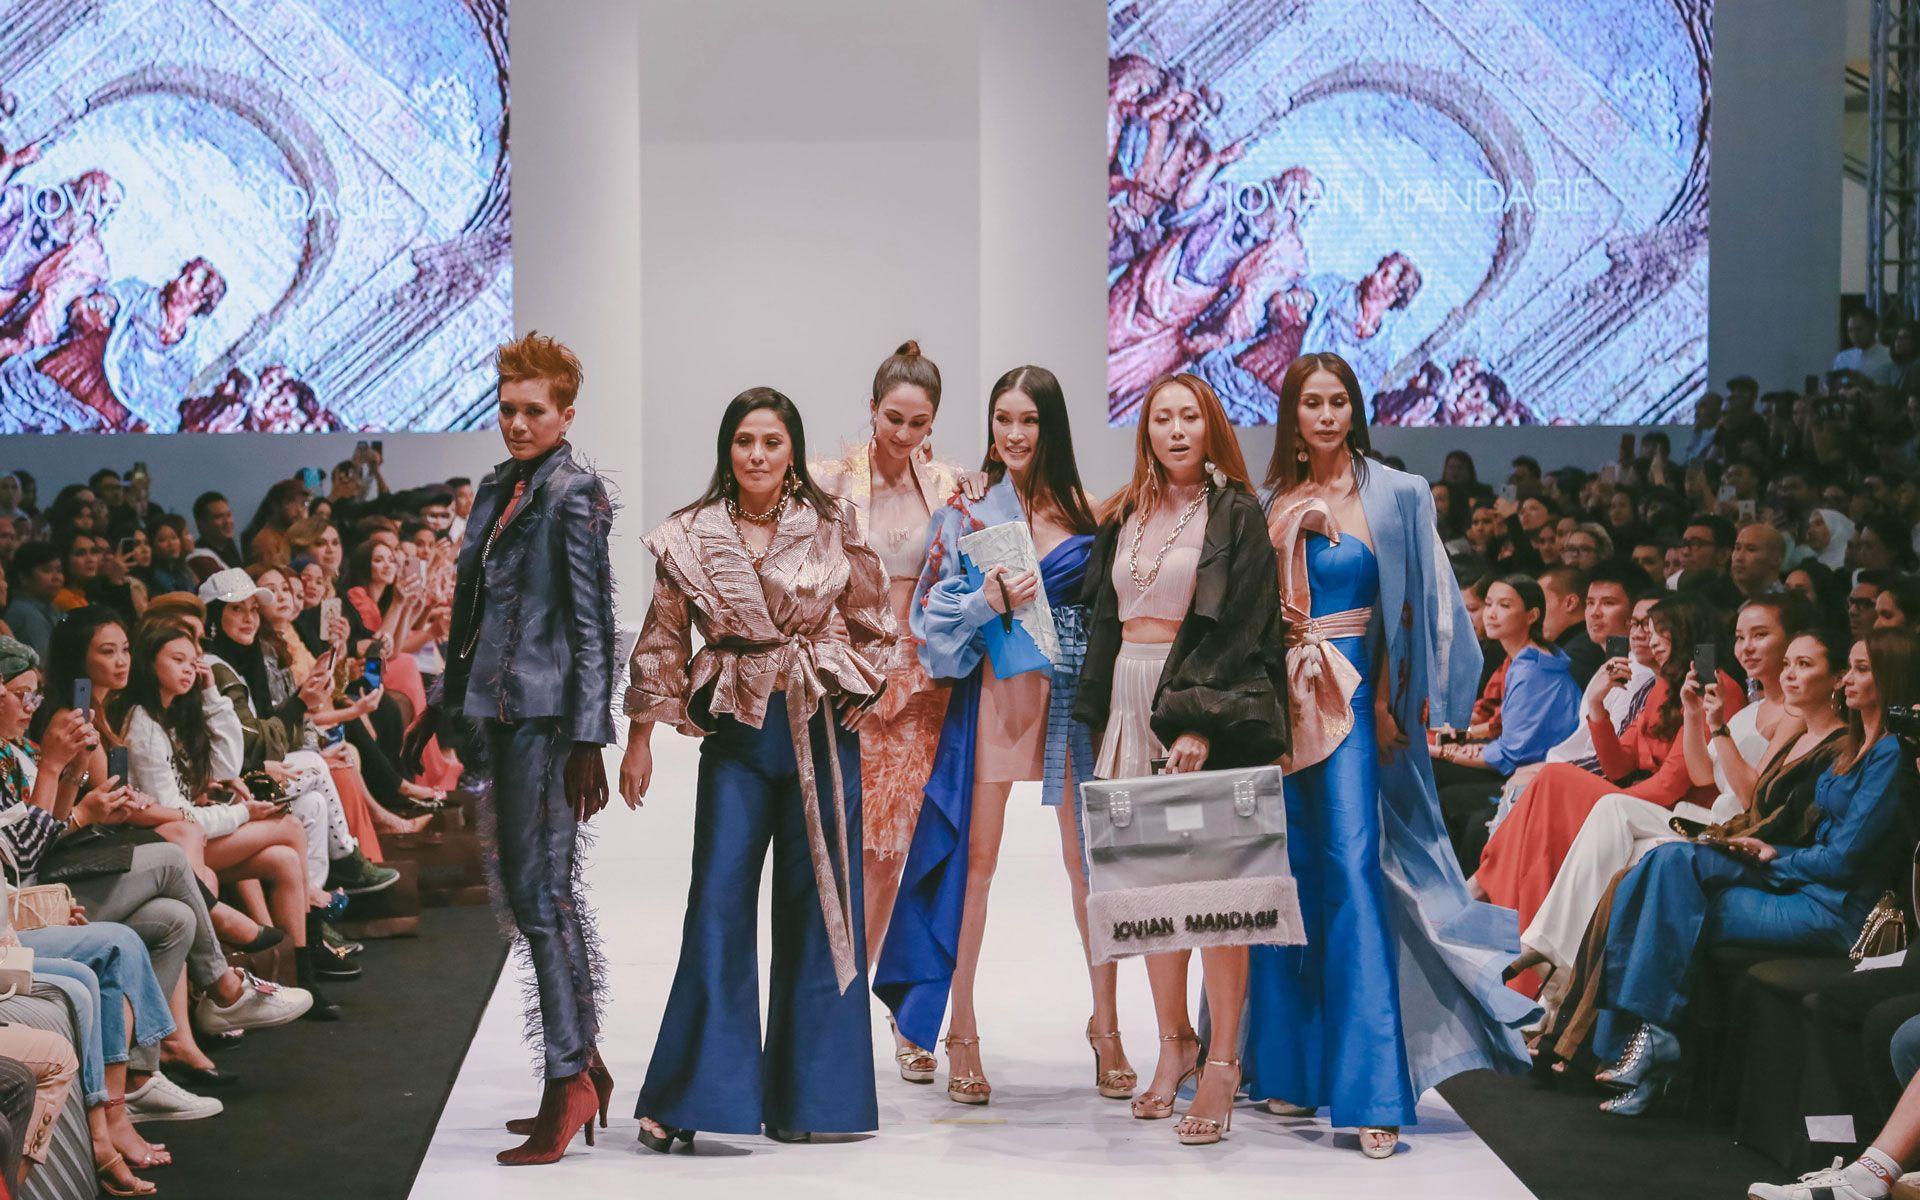 Tinie, Aleeza Kasim, Deborah Henry, Amber Chia, Vanessa Tevi and Fazdlun Abas posing during the finale at Dato' Jovian Mandagie's show. (Photo: Khairul Imran)